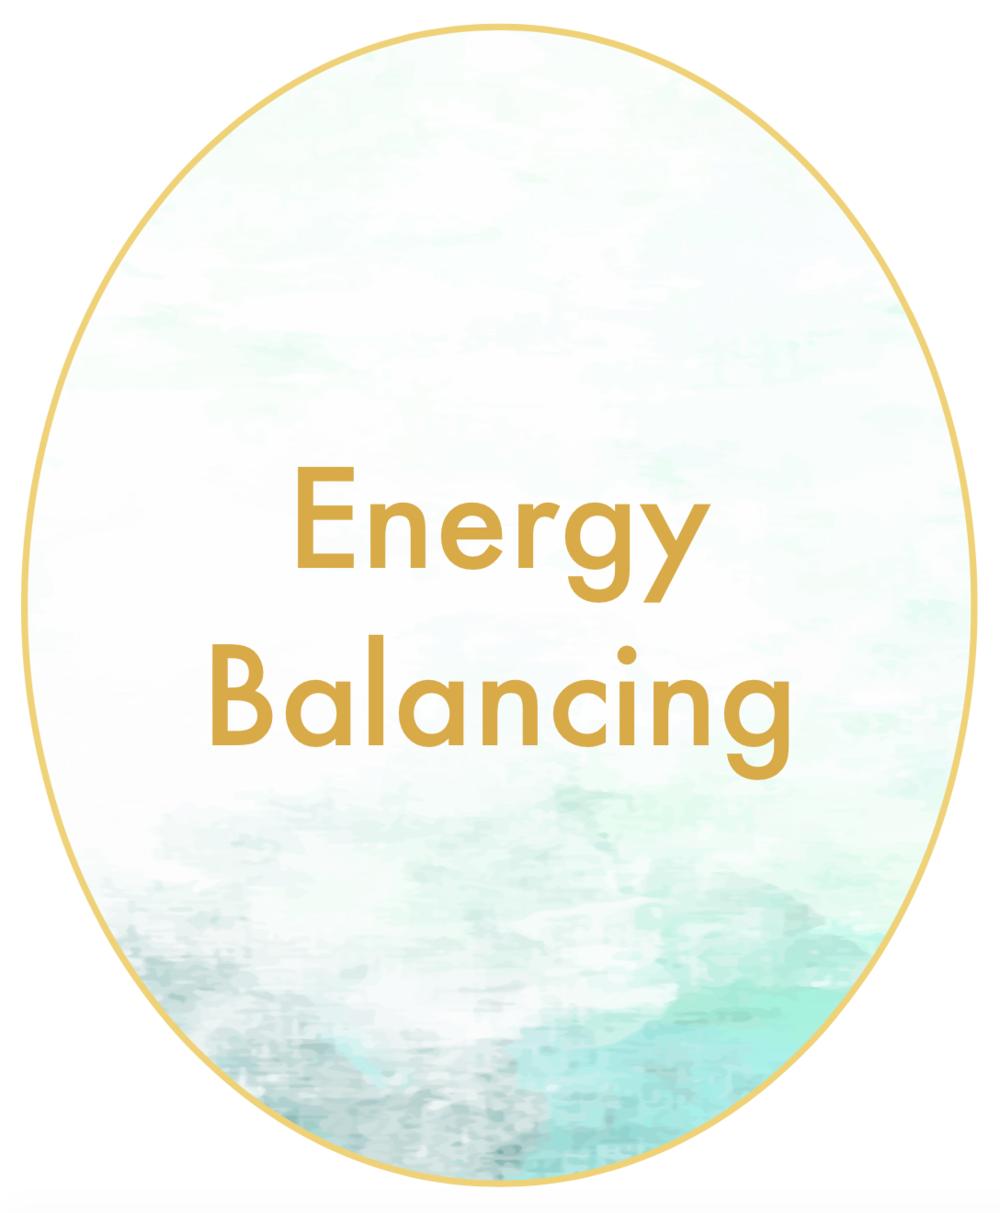 energy balancing.png